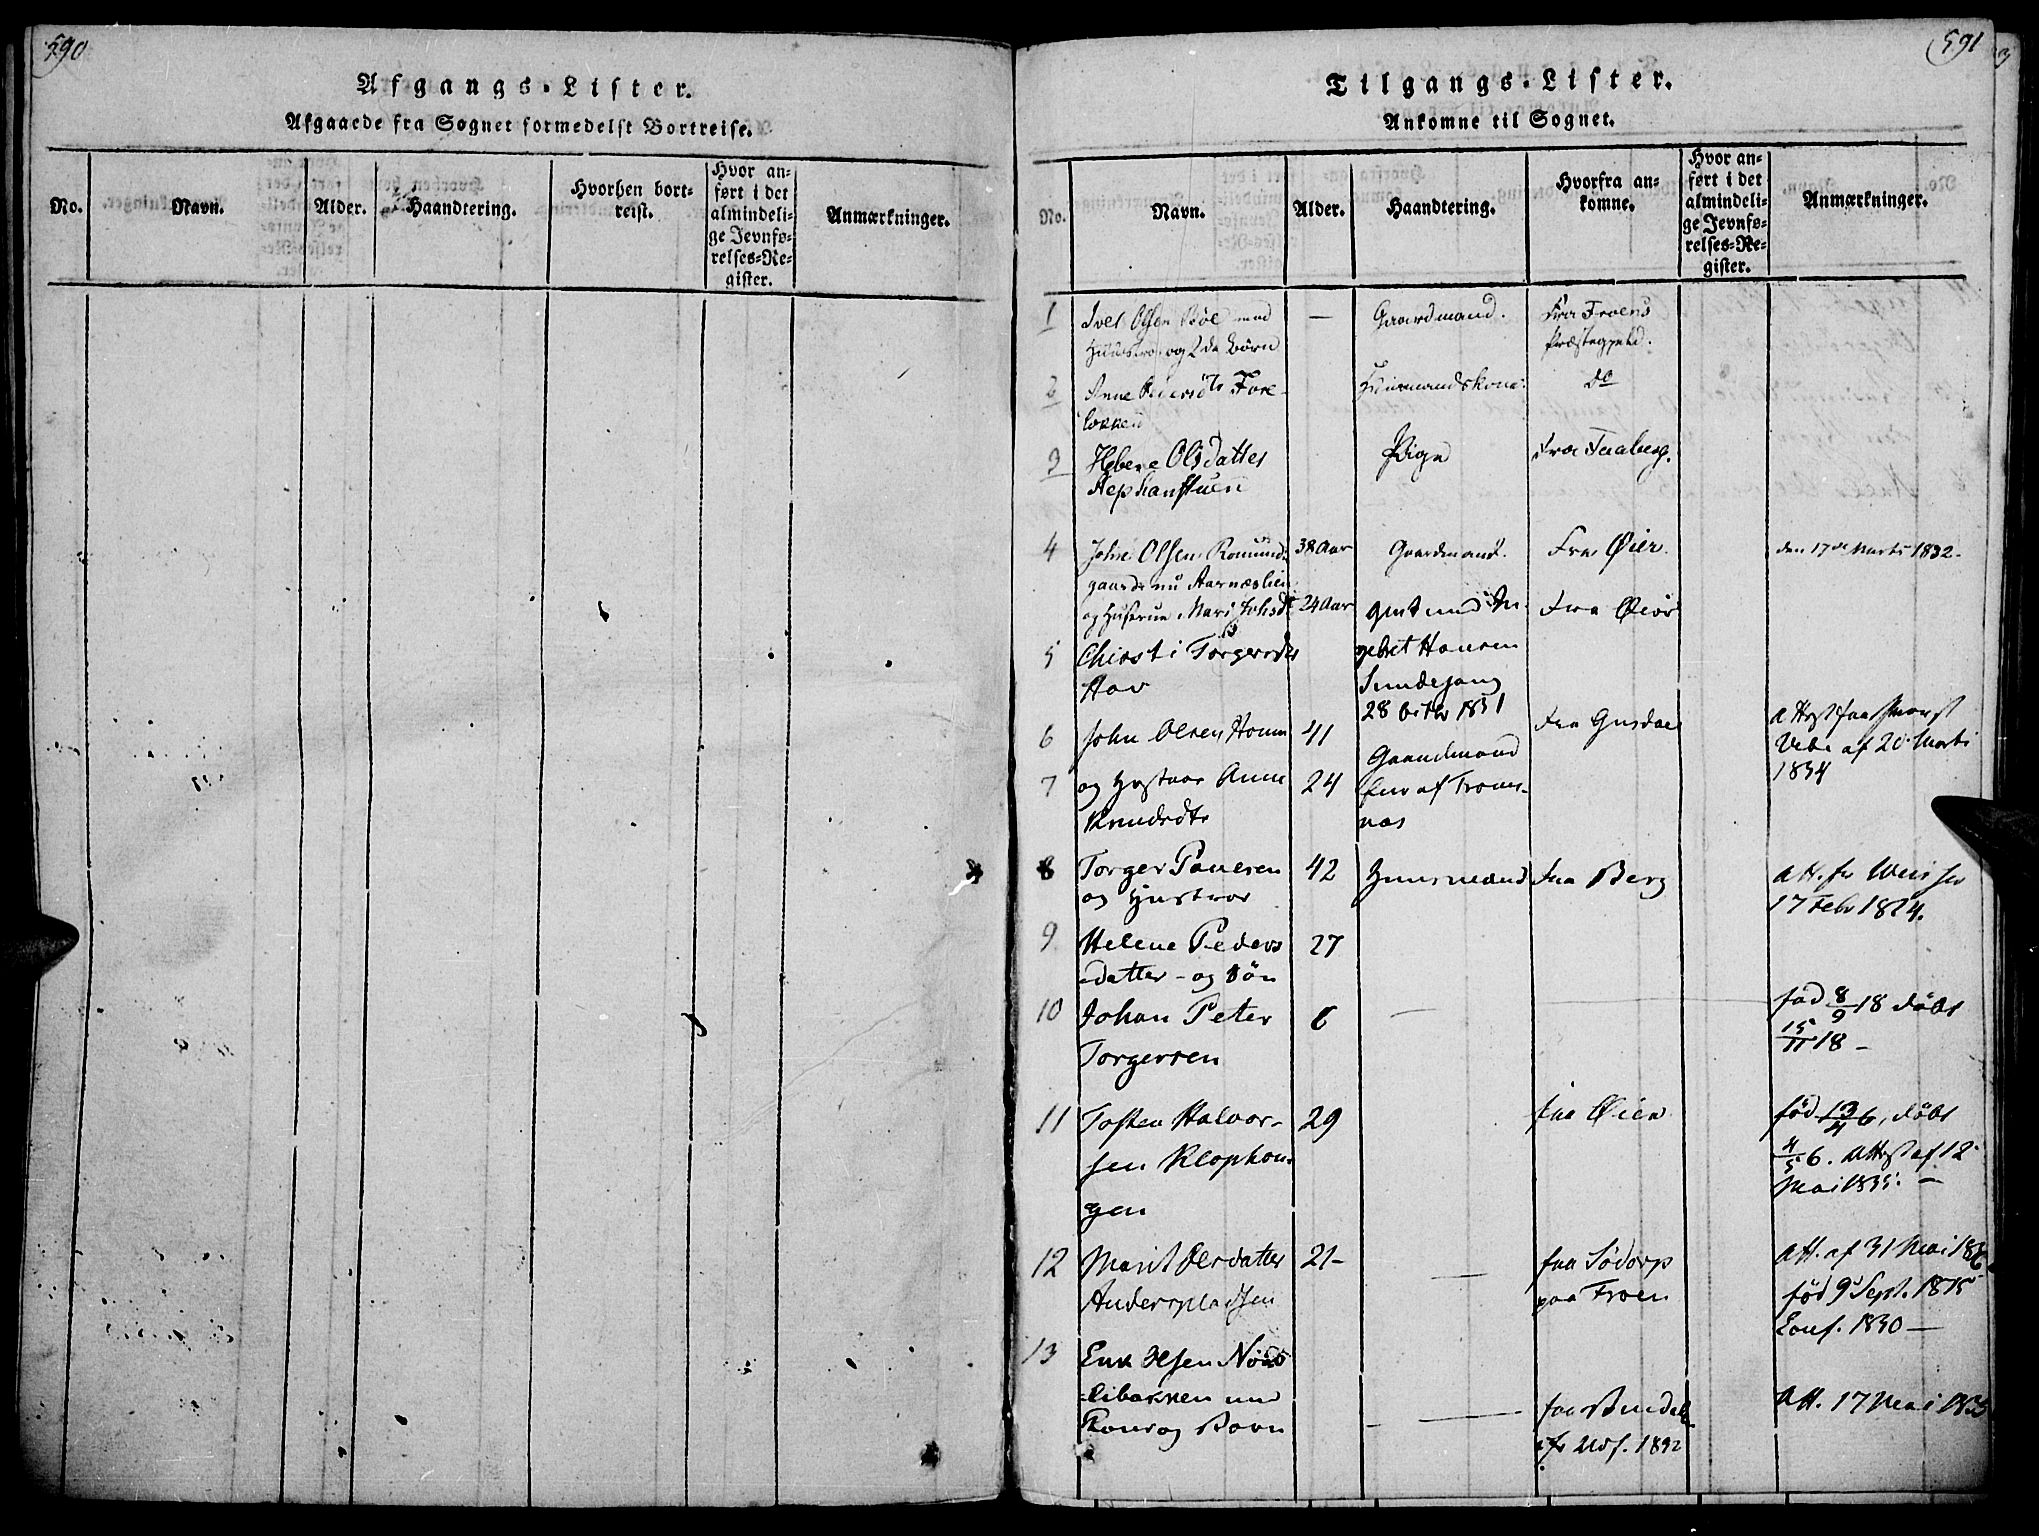 SAH, Ringebu prestekontor, Ministerialbok nr. 4, 1821-1839, s. 590-591